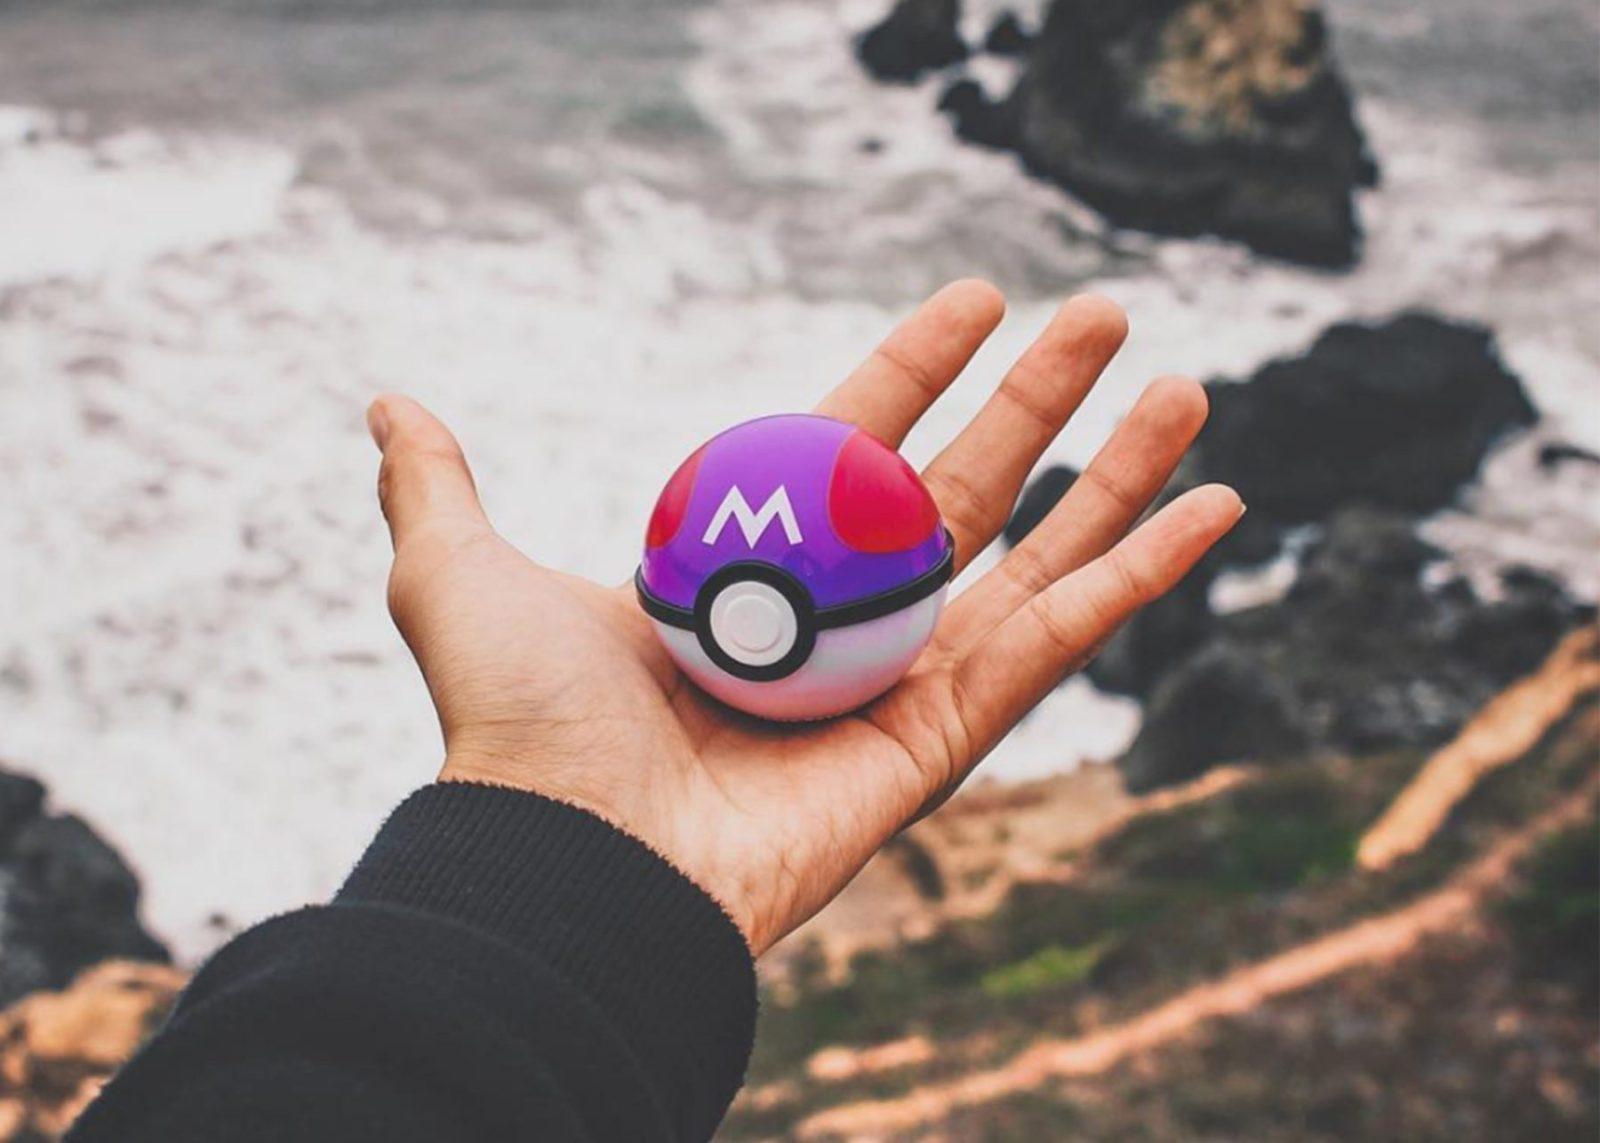 Pokémon GO: Catch 'Em All in San Francisco | 49 Miles: The